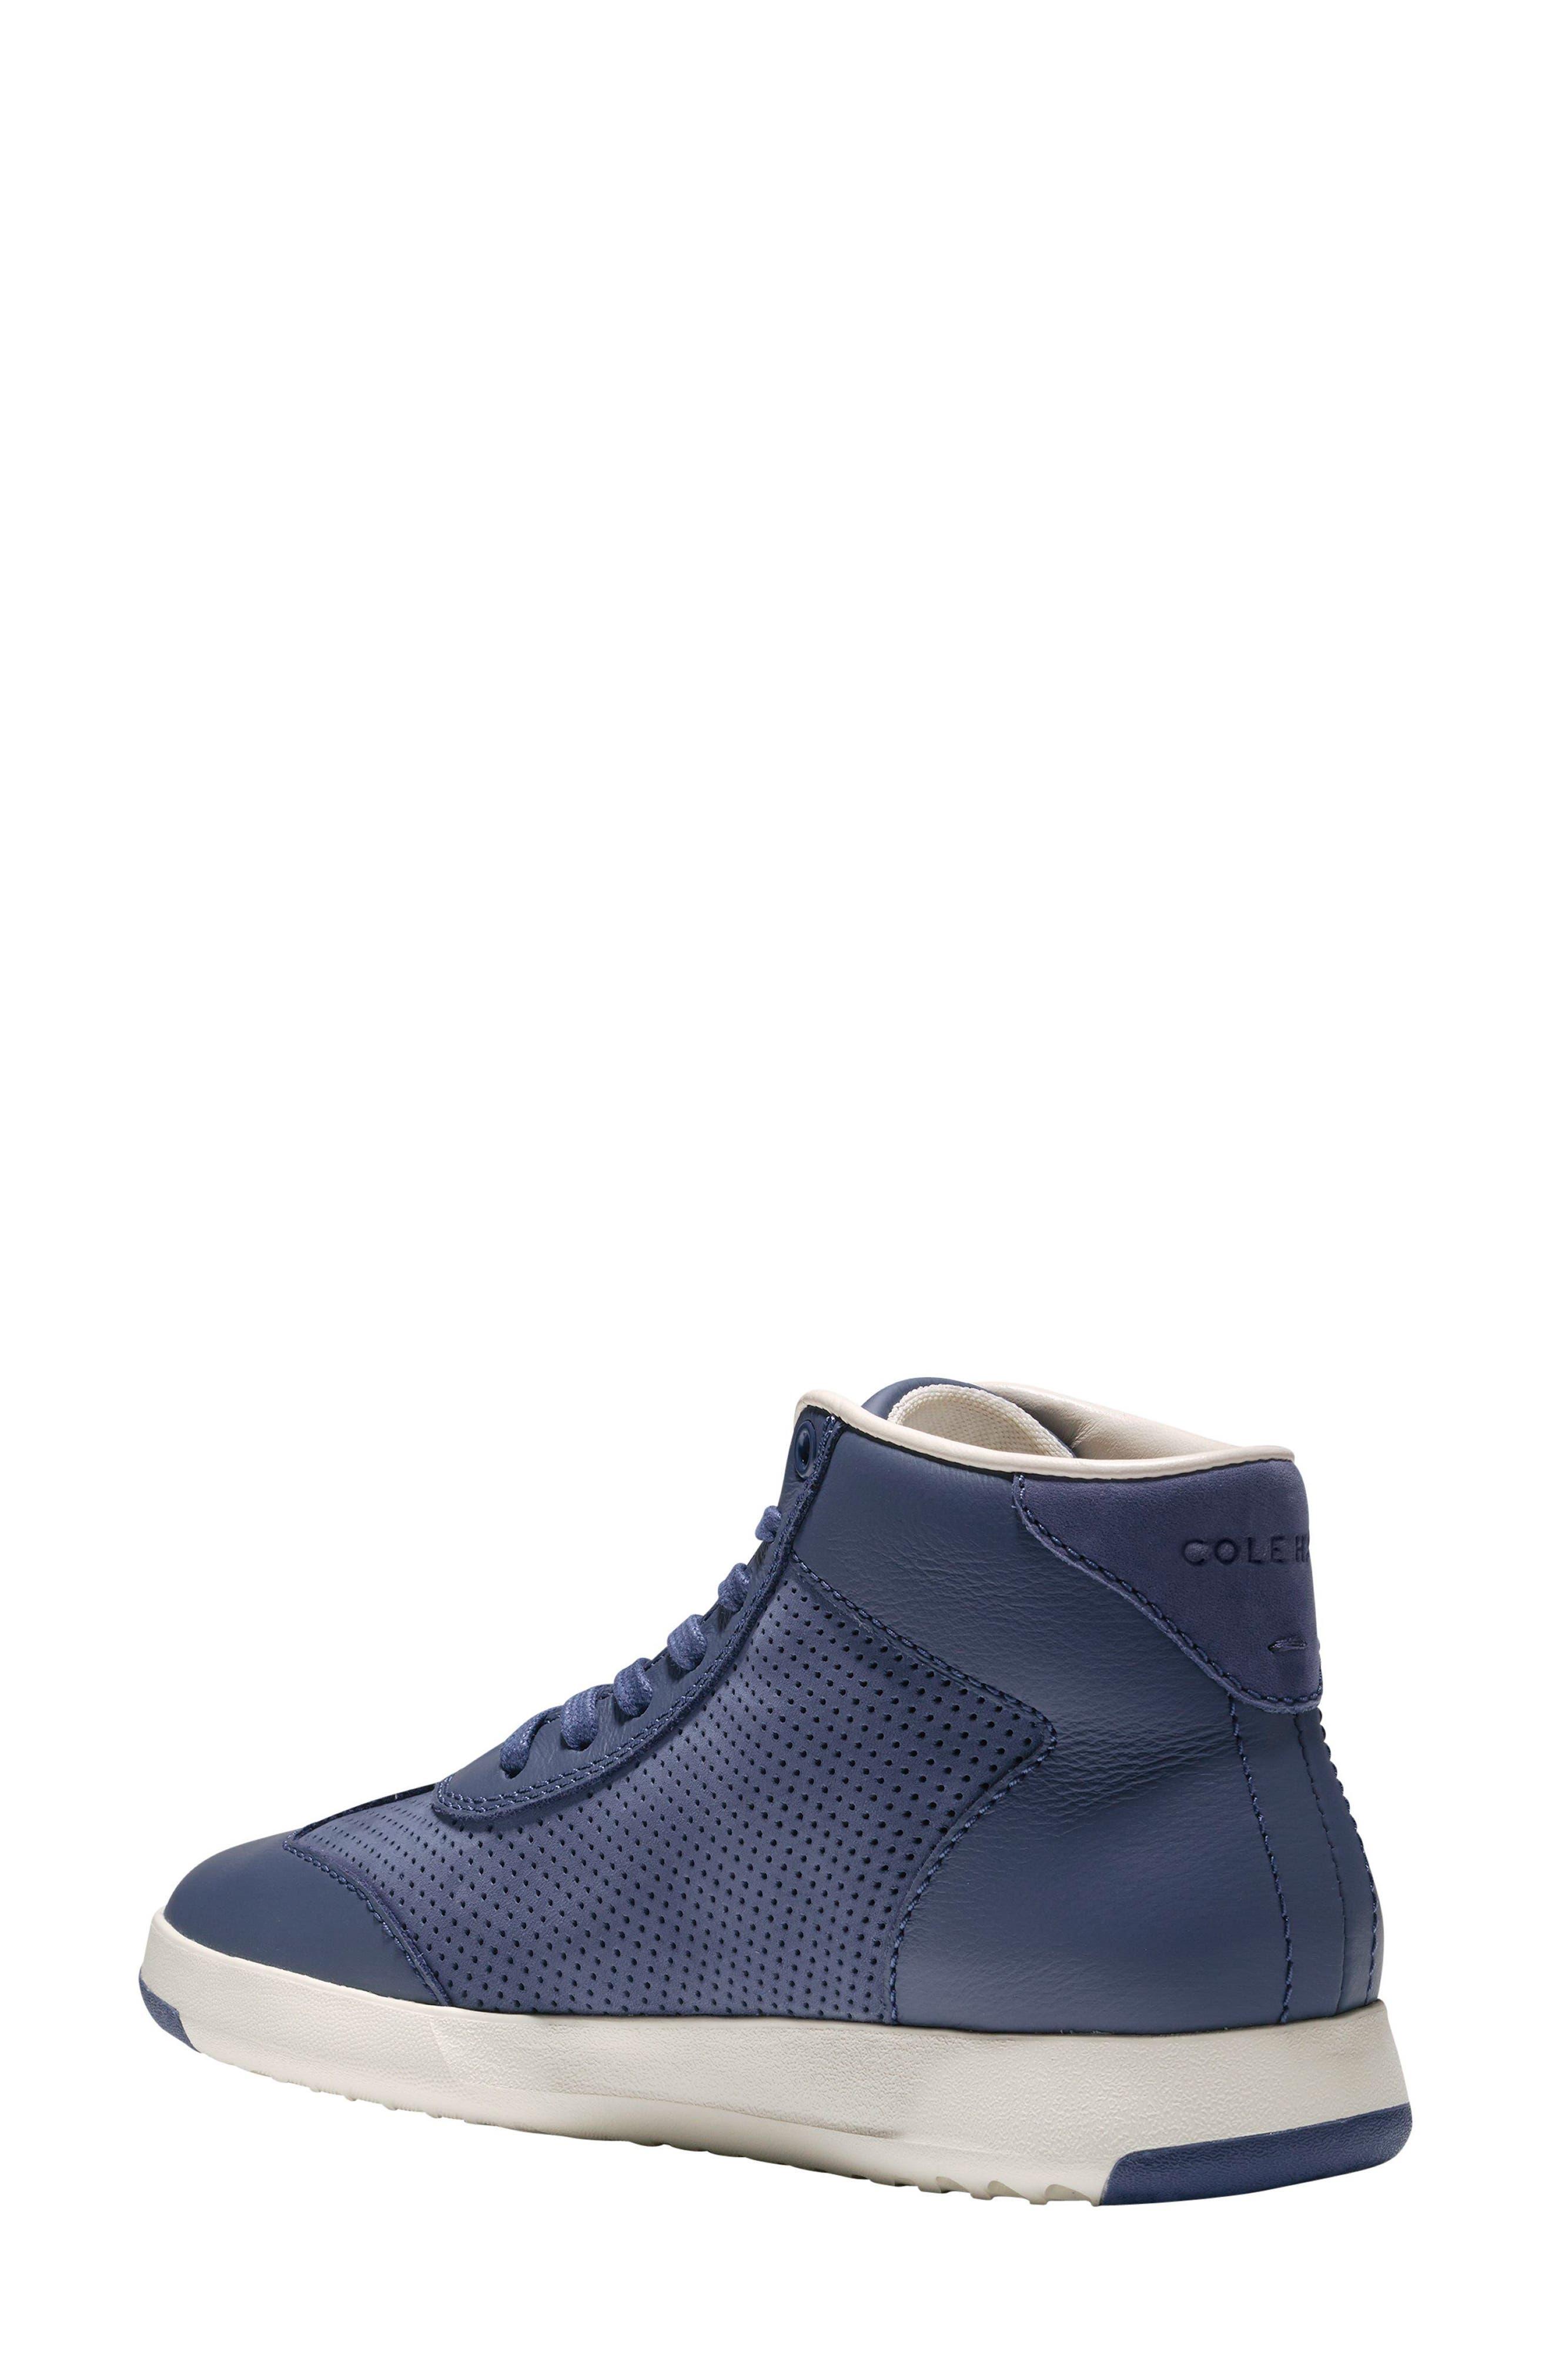 GrandPro High Top Sneaker,                             Alternate thumbnail 6, color,